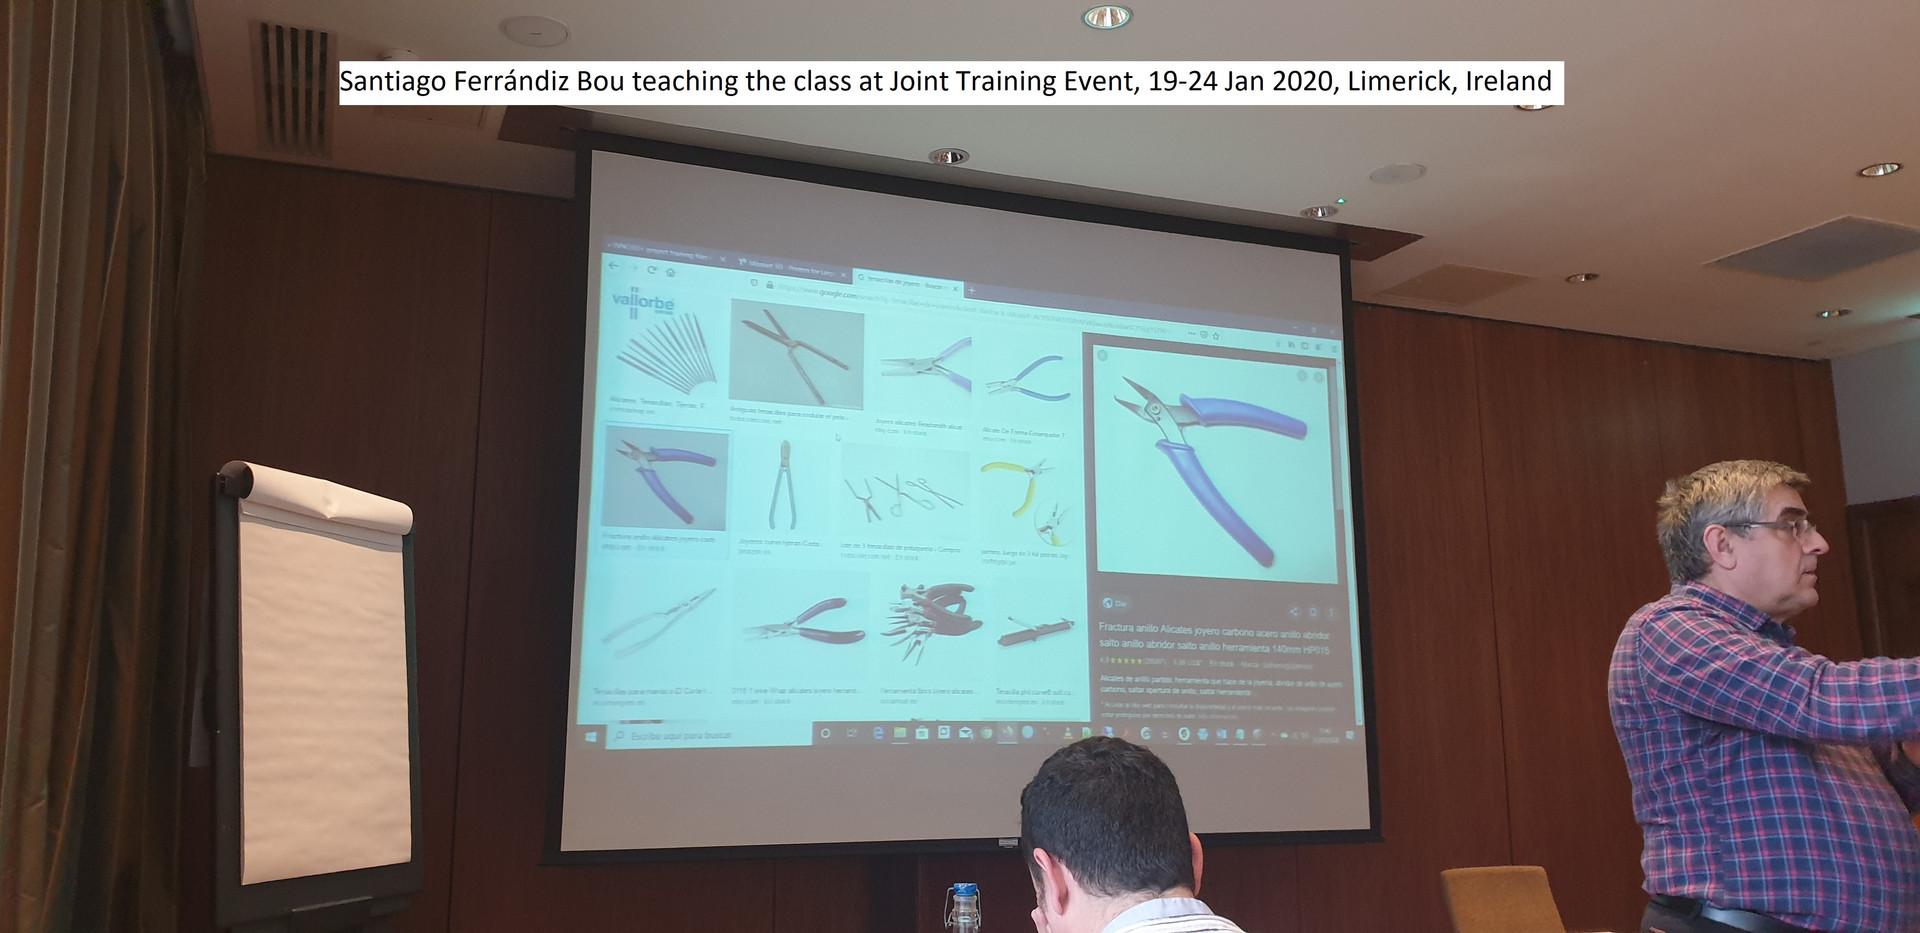 Santiago Ferrandiz Bou teaching the clas